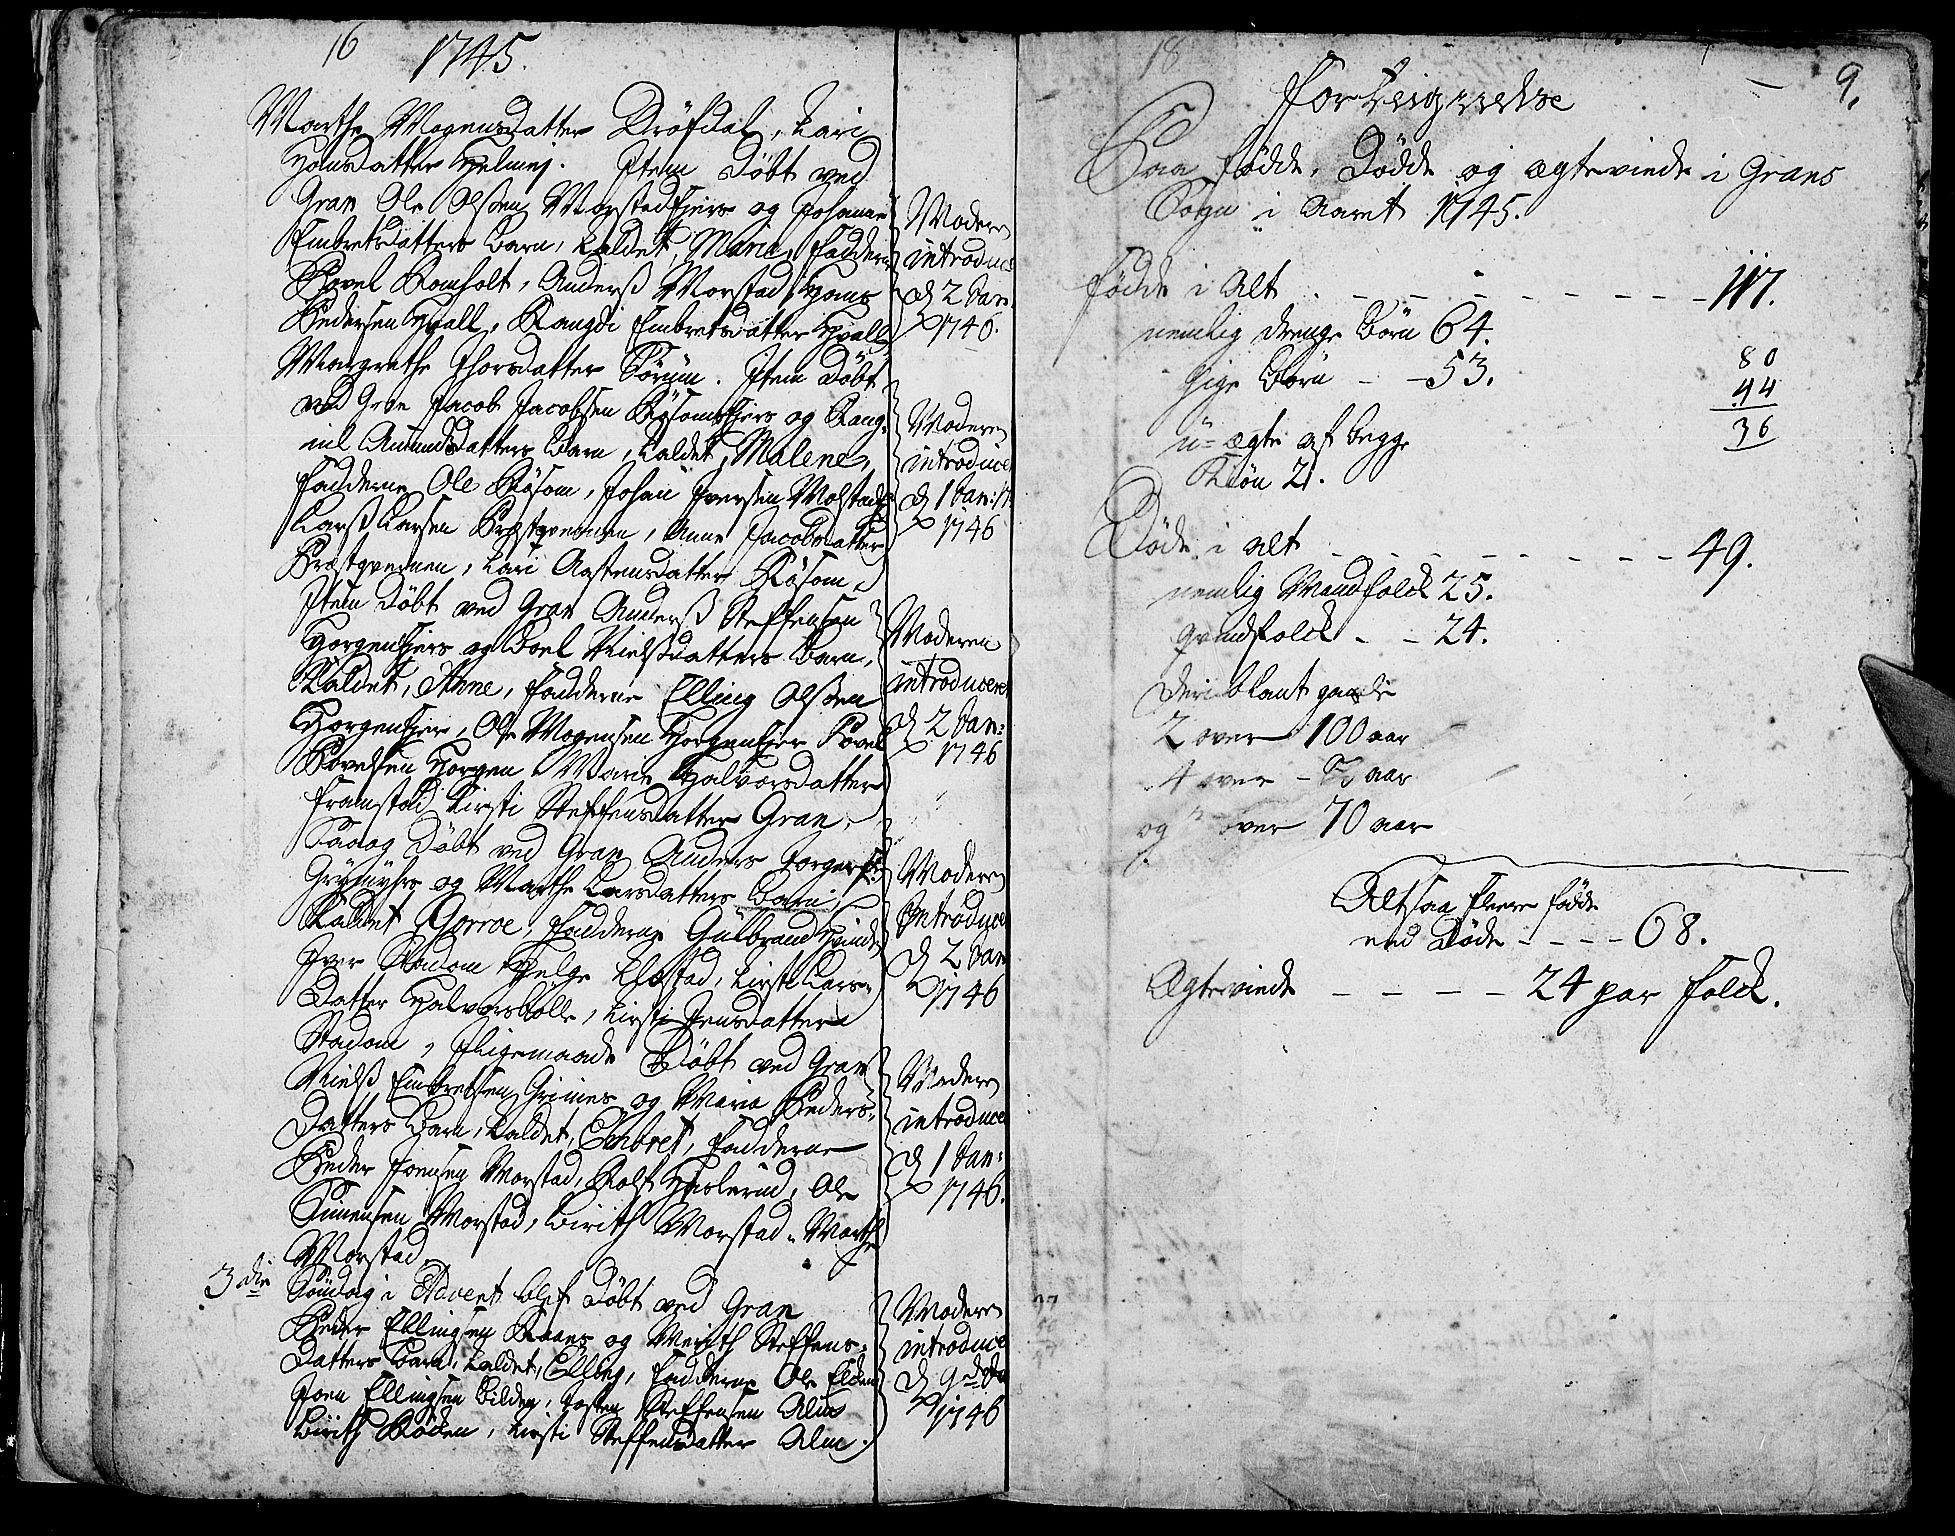 SAH, Gran prestekontor, Ministerialbok nr. 3, 1745-1758, s. 9